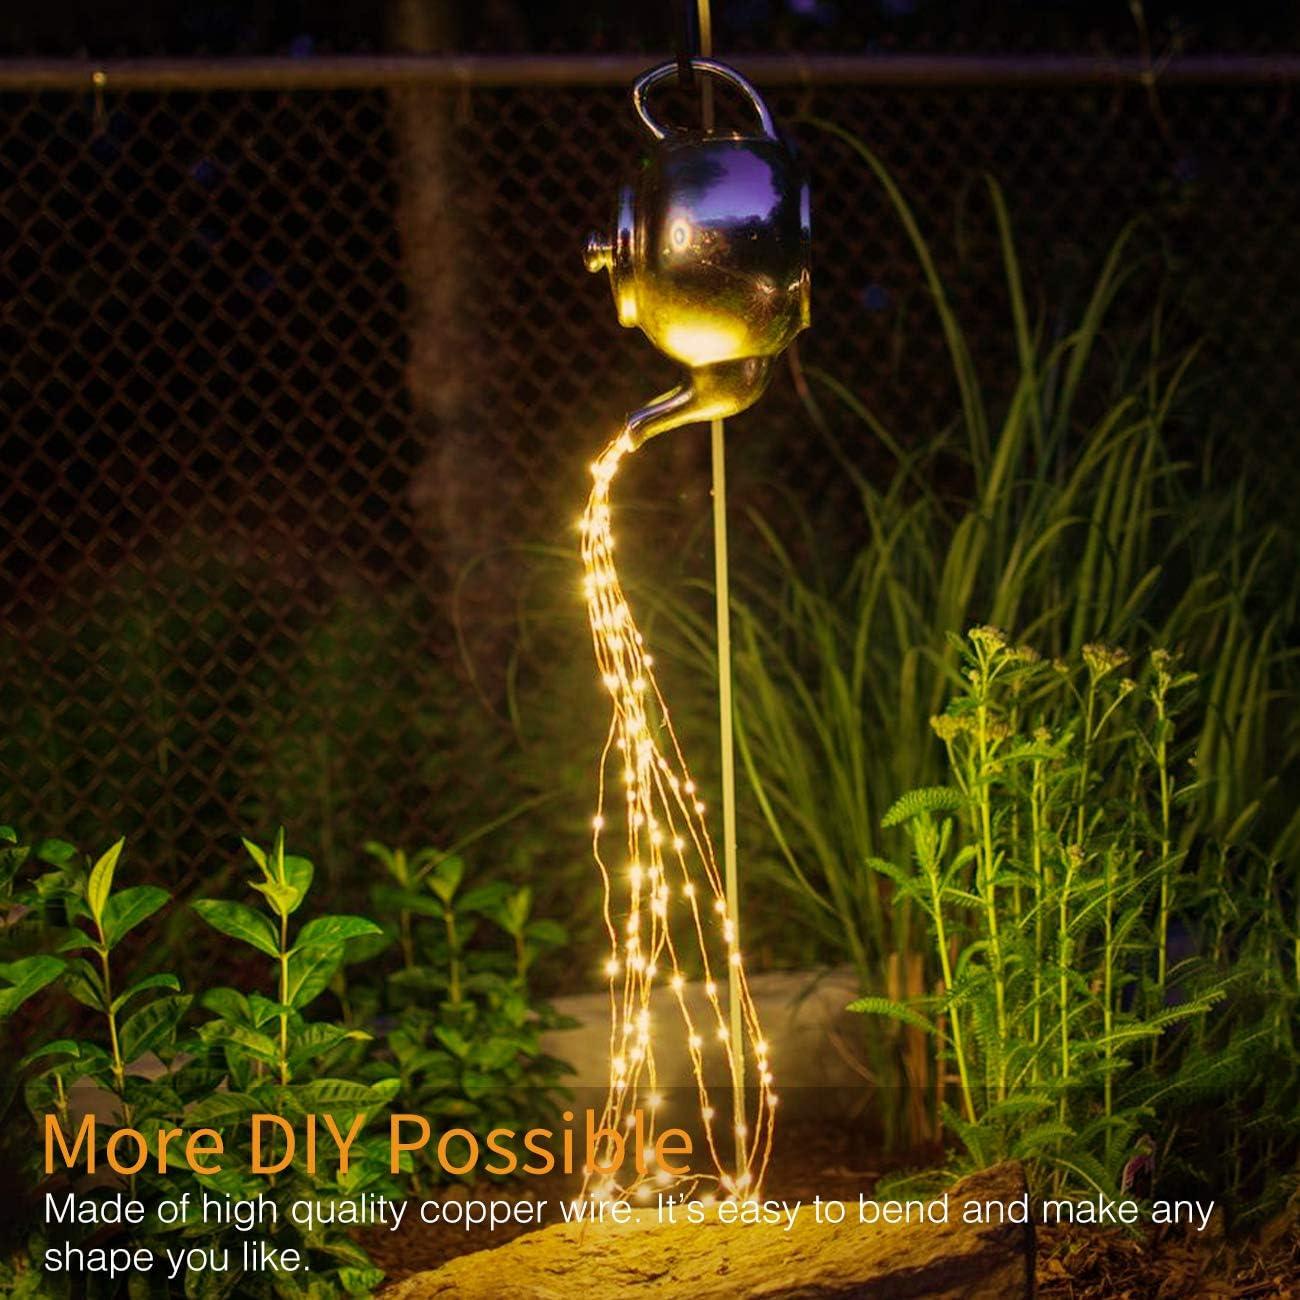 Guirnalda Luces Pilas Litogo Luces LED Pilas 12m 120 LED Luces LED Decoracion 8 Modos Impermeable Luces LED Cadena Micro con Funci/ón de Temporizador para Decoraci/ón Bodas Fiesta de Navidad 2 Pack